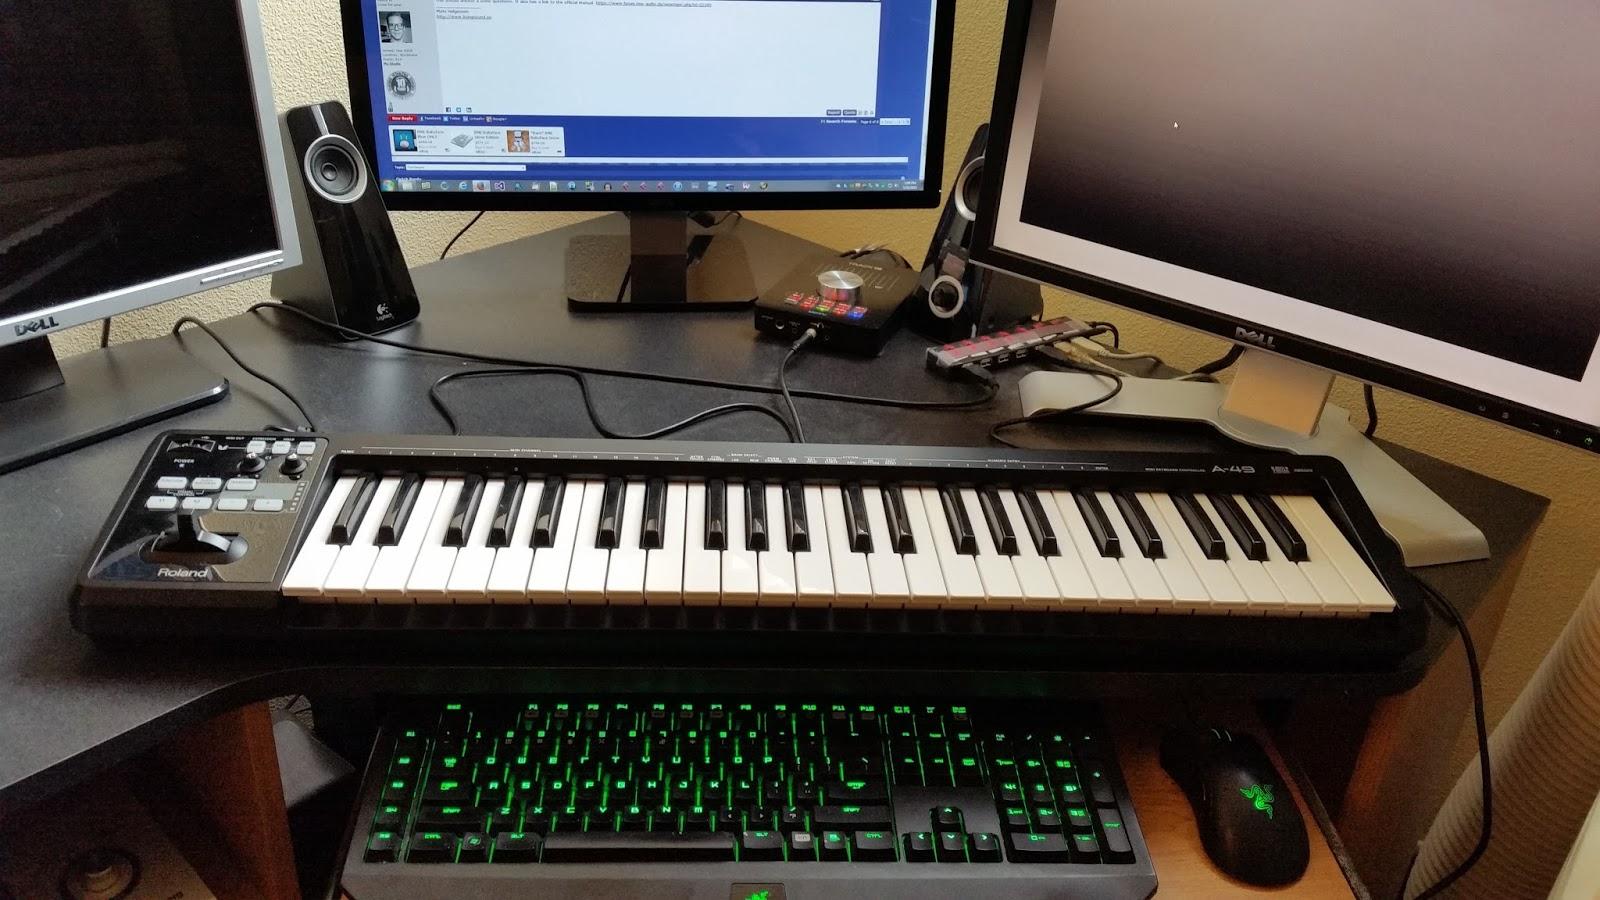 fl studio midi keyboard setup